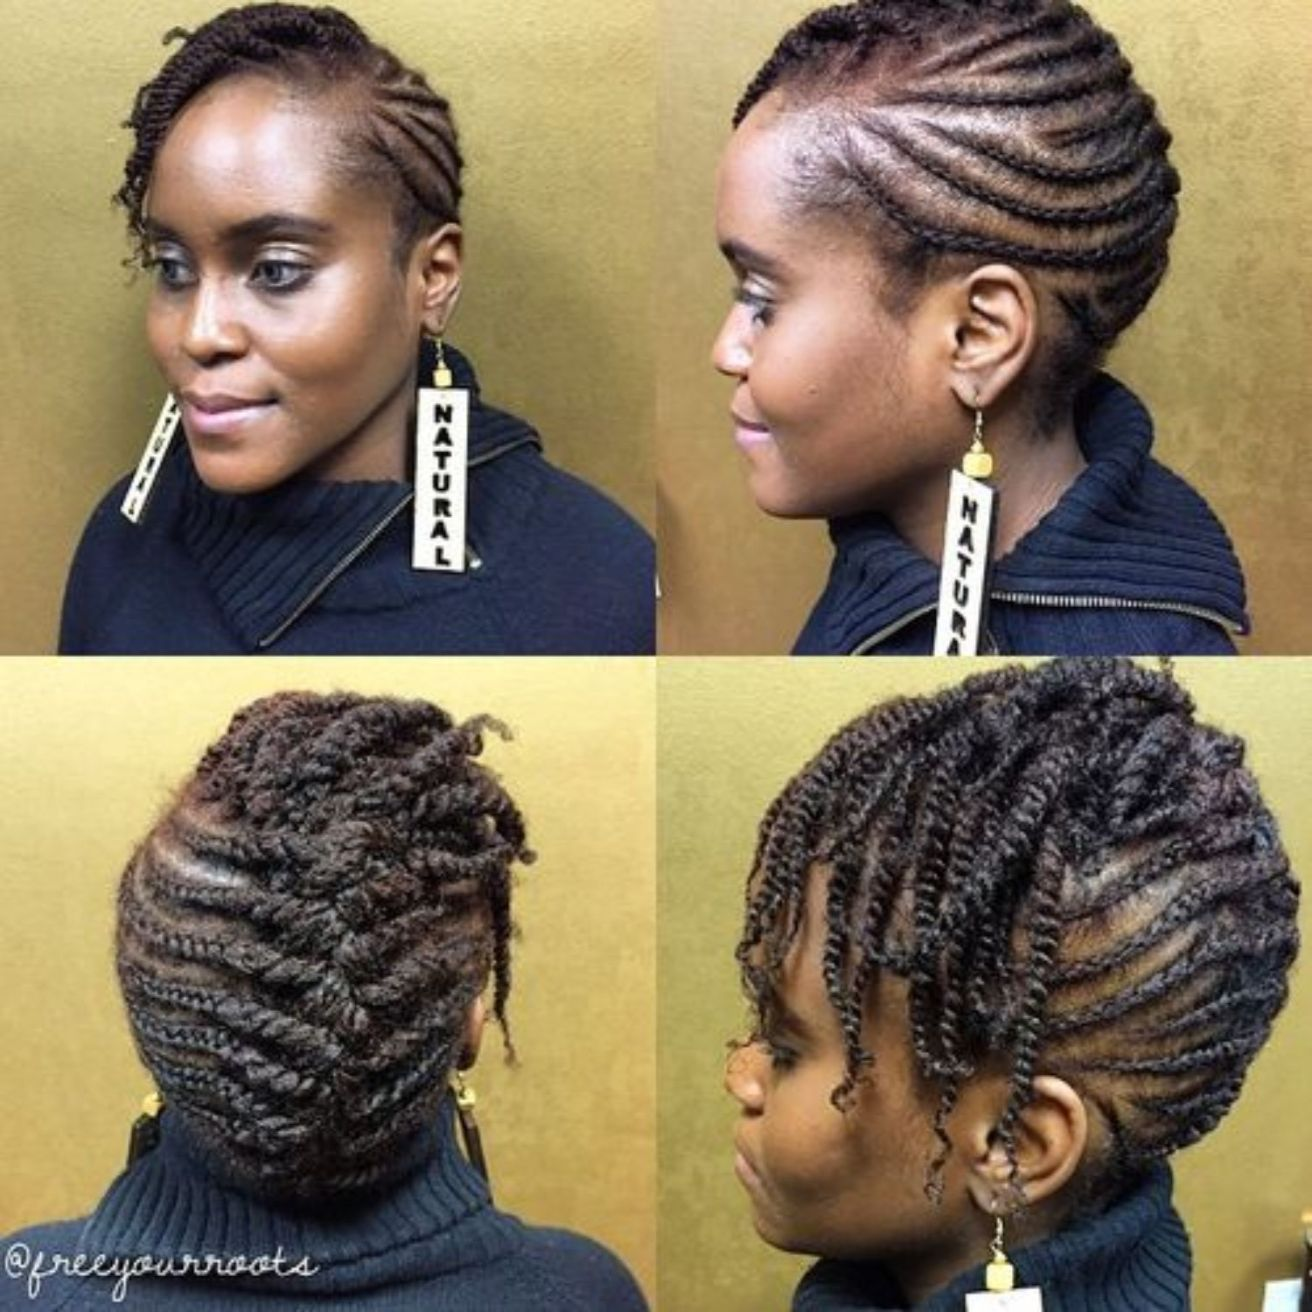 Braided Mohawk For Short Natural Hair Short Natural Hair Styles Natural Hair Braids Natural Hair Styles